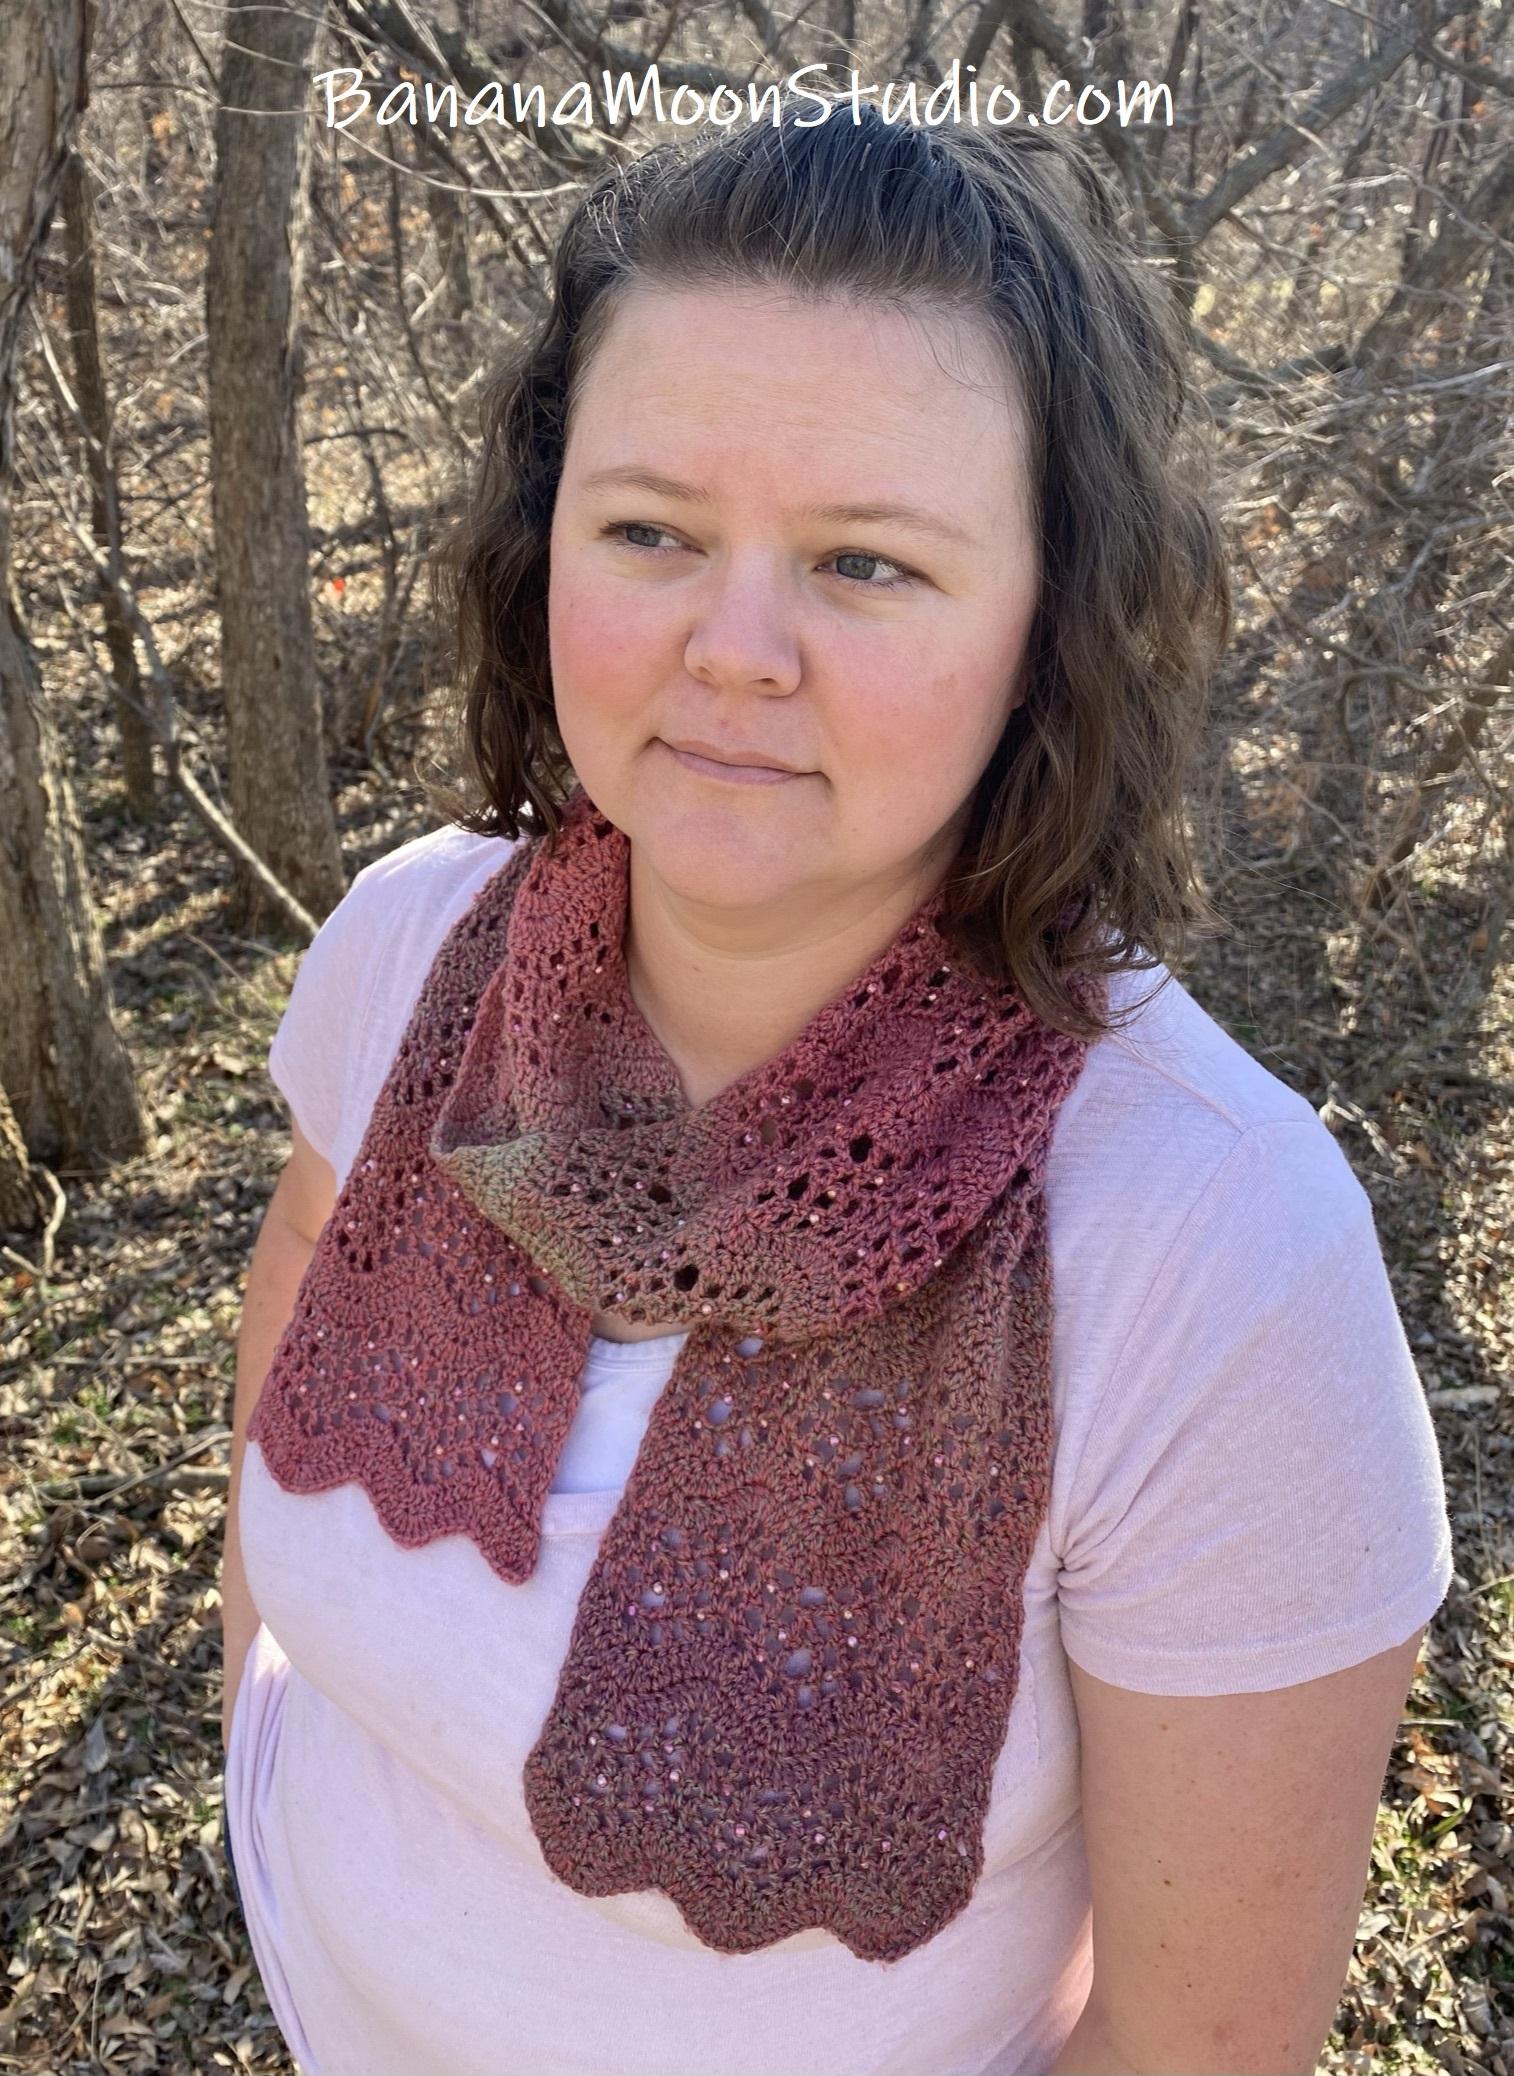 beaded crochet scarf pattern from Banana Moon Studio